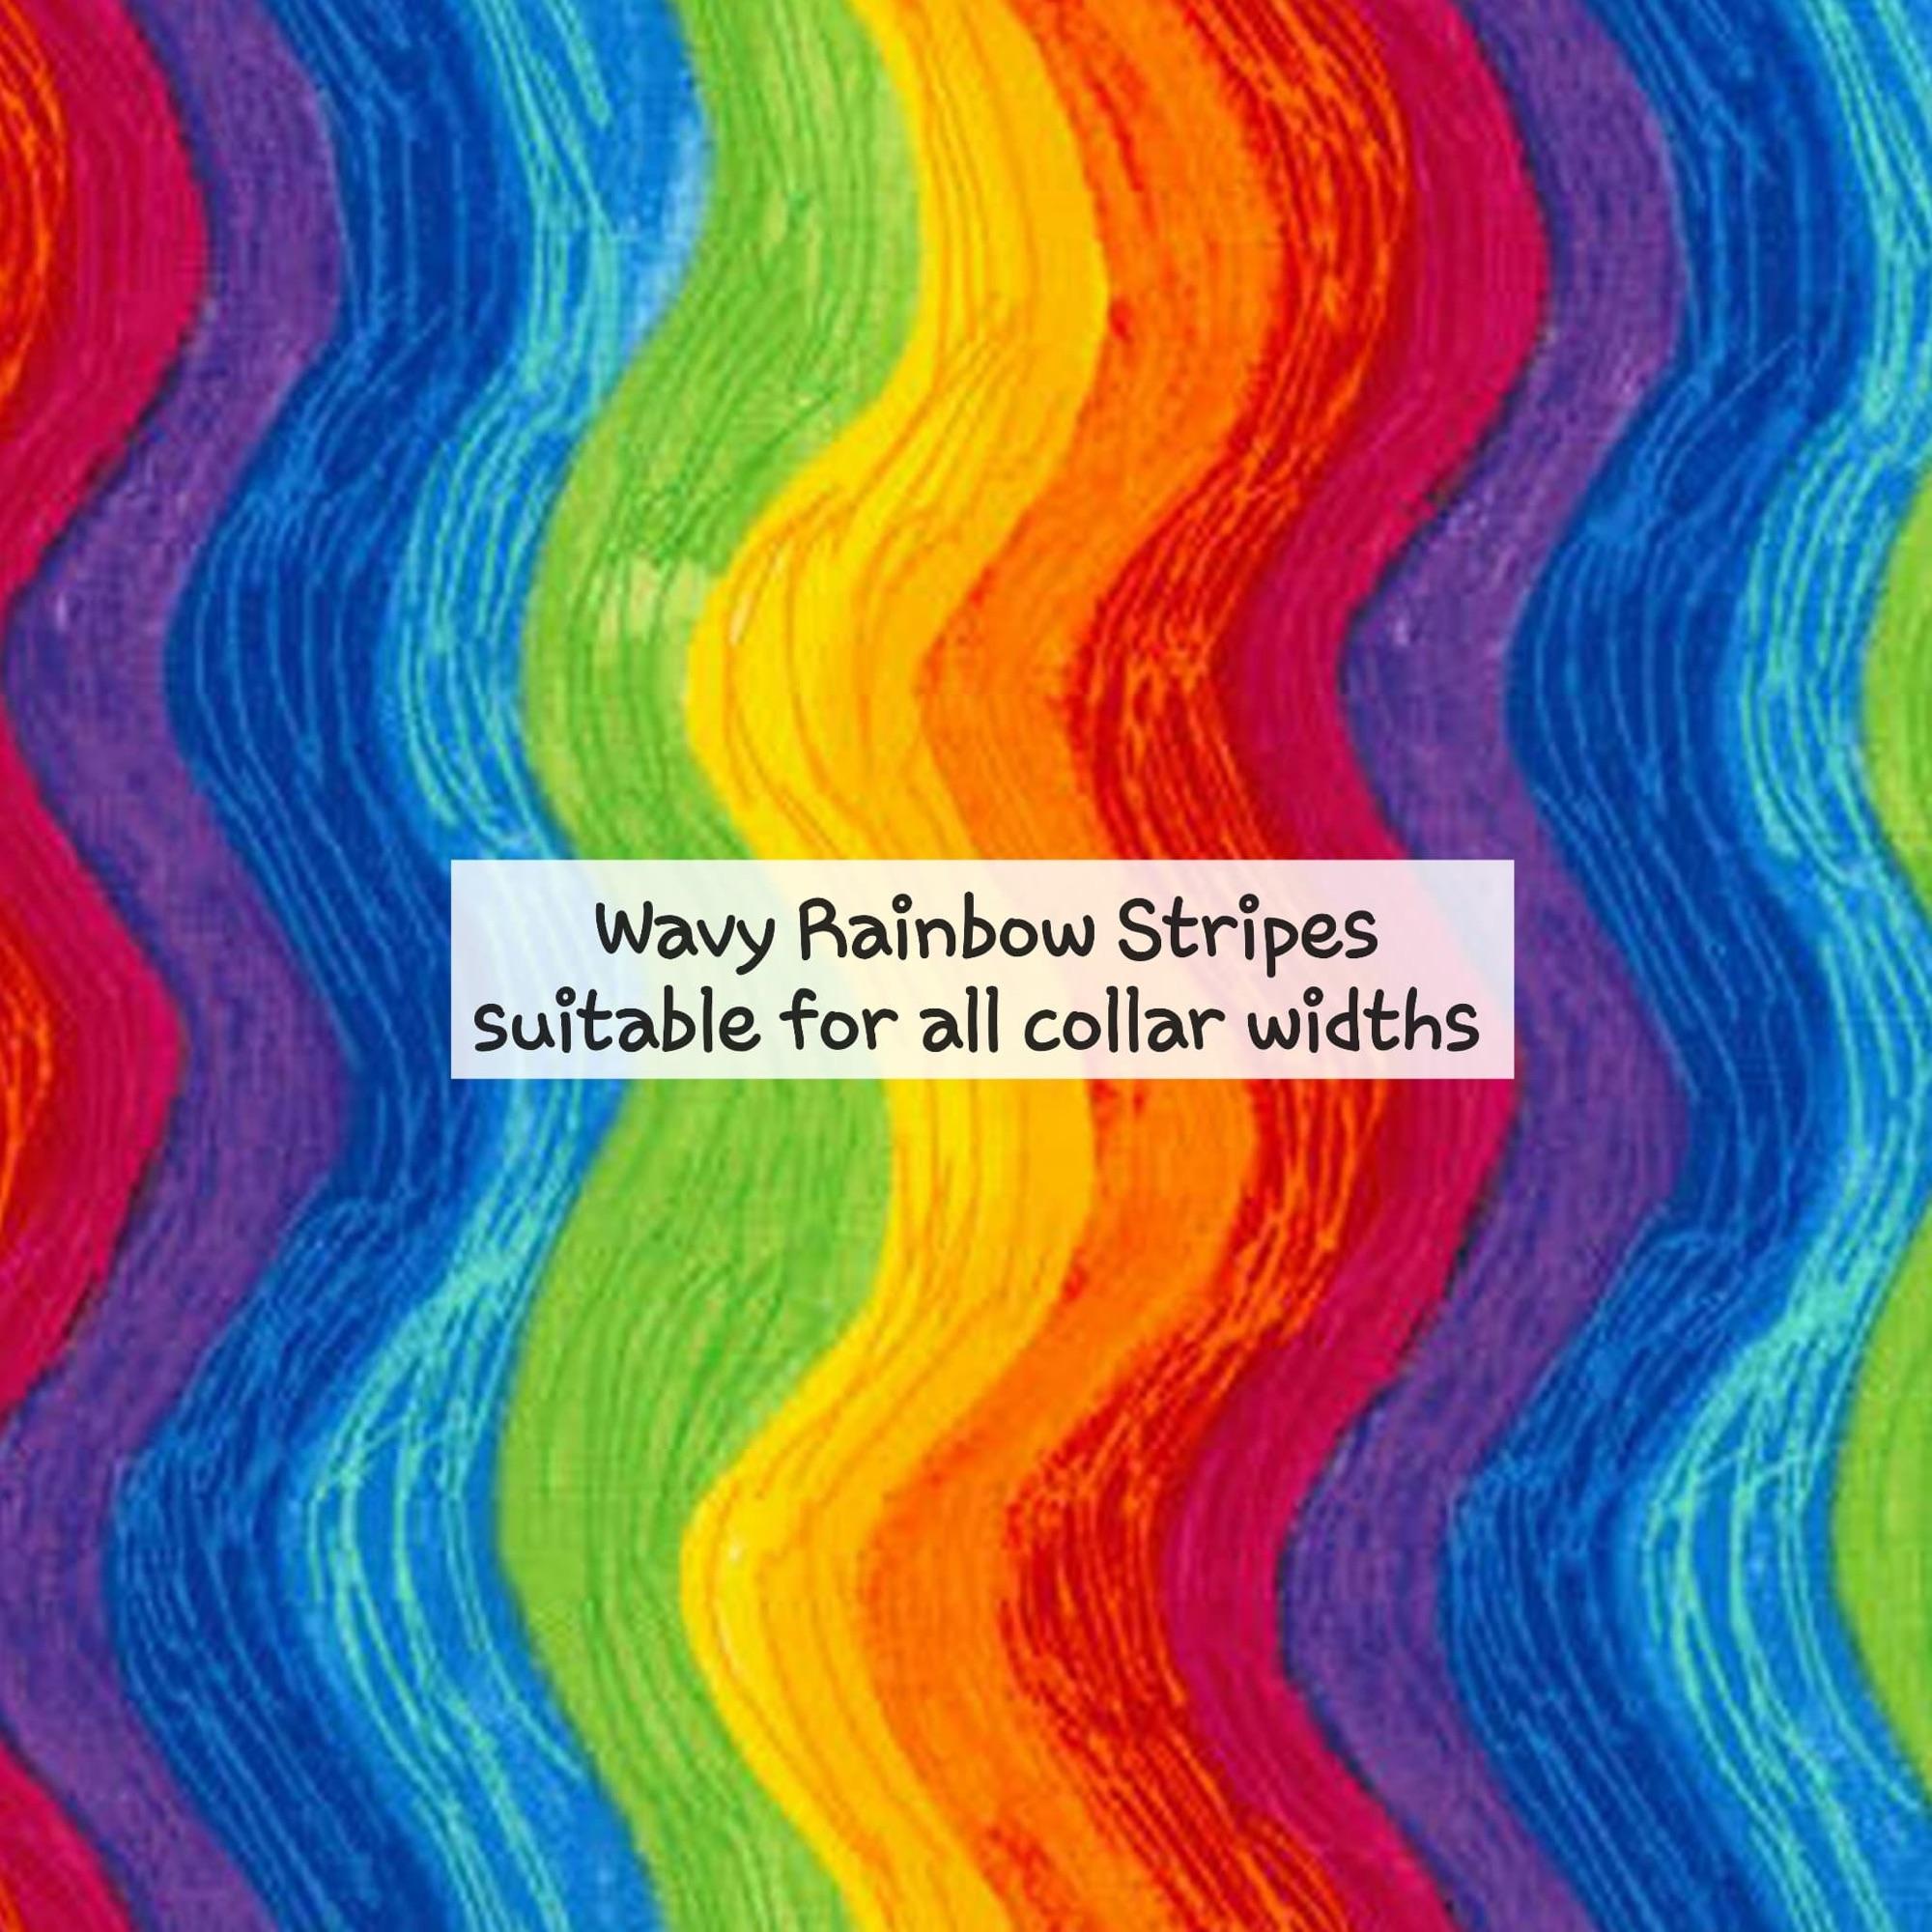 Wavy Rainbow Stripes